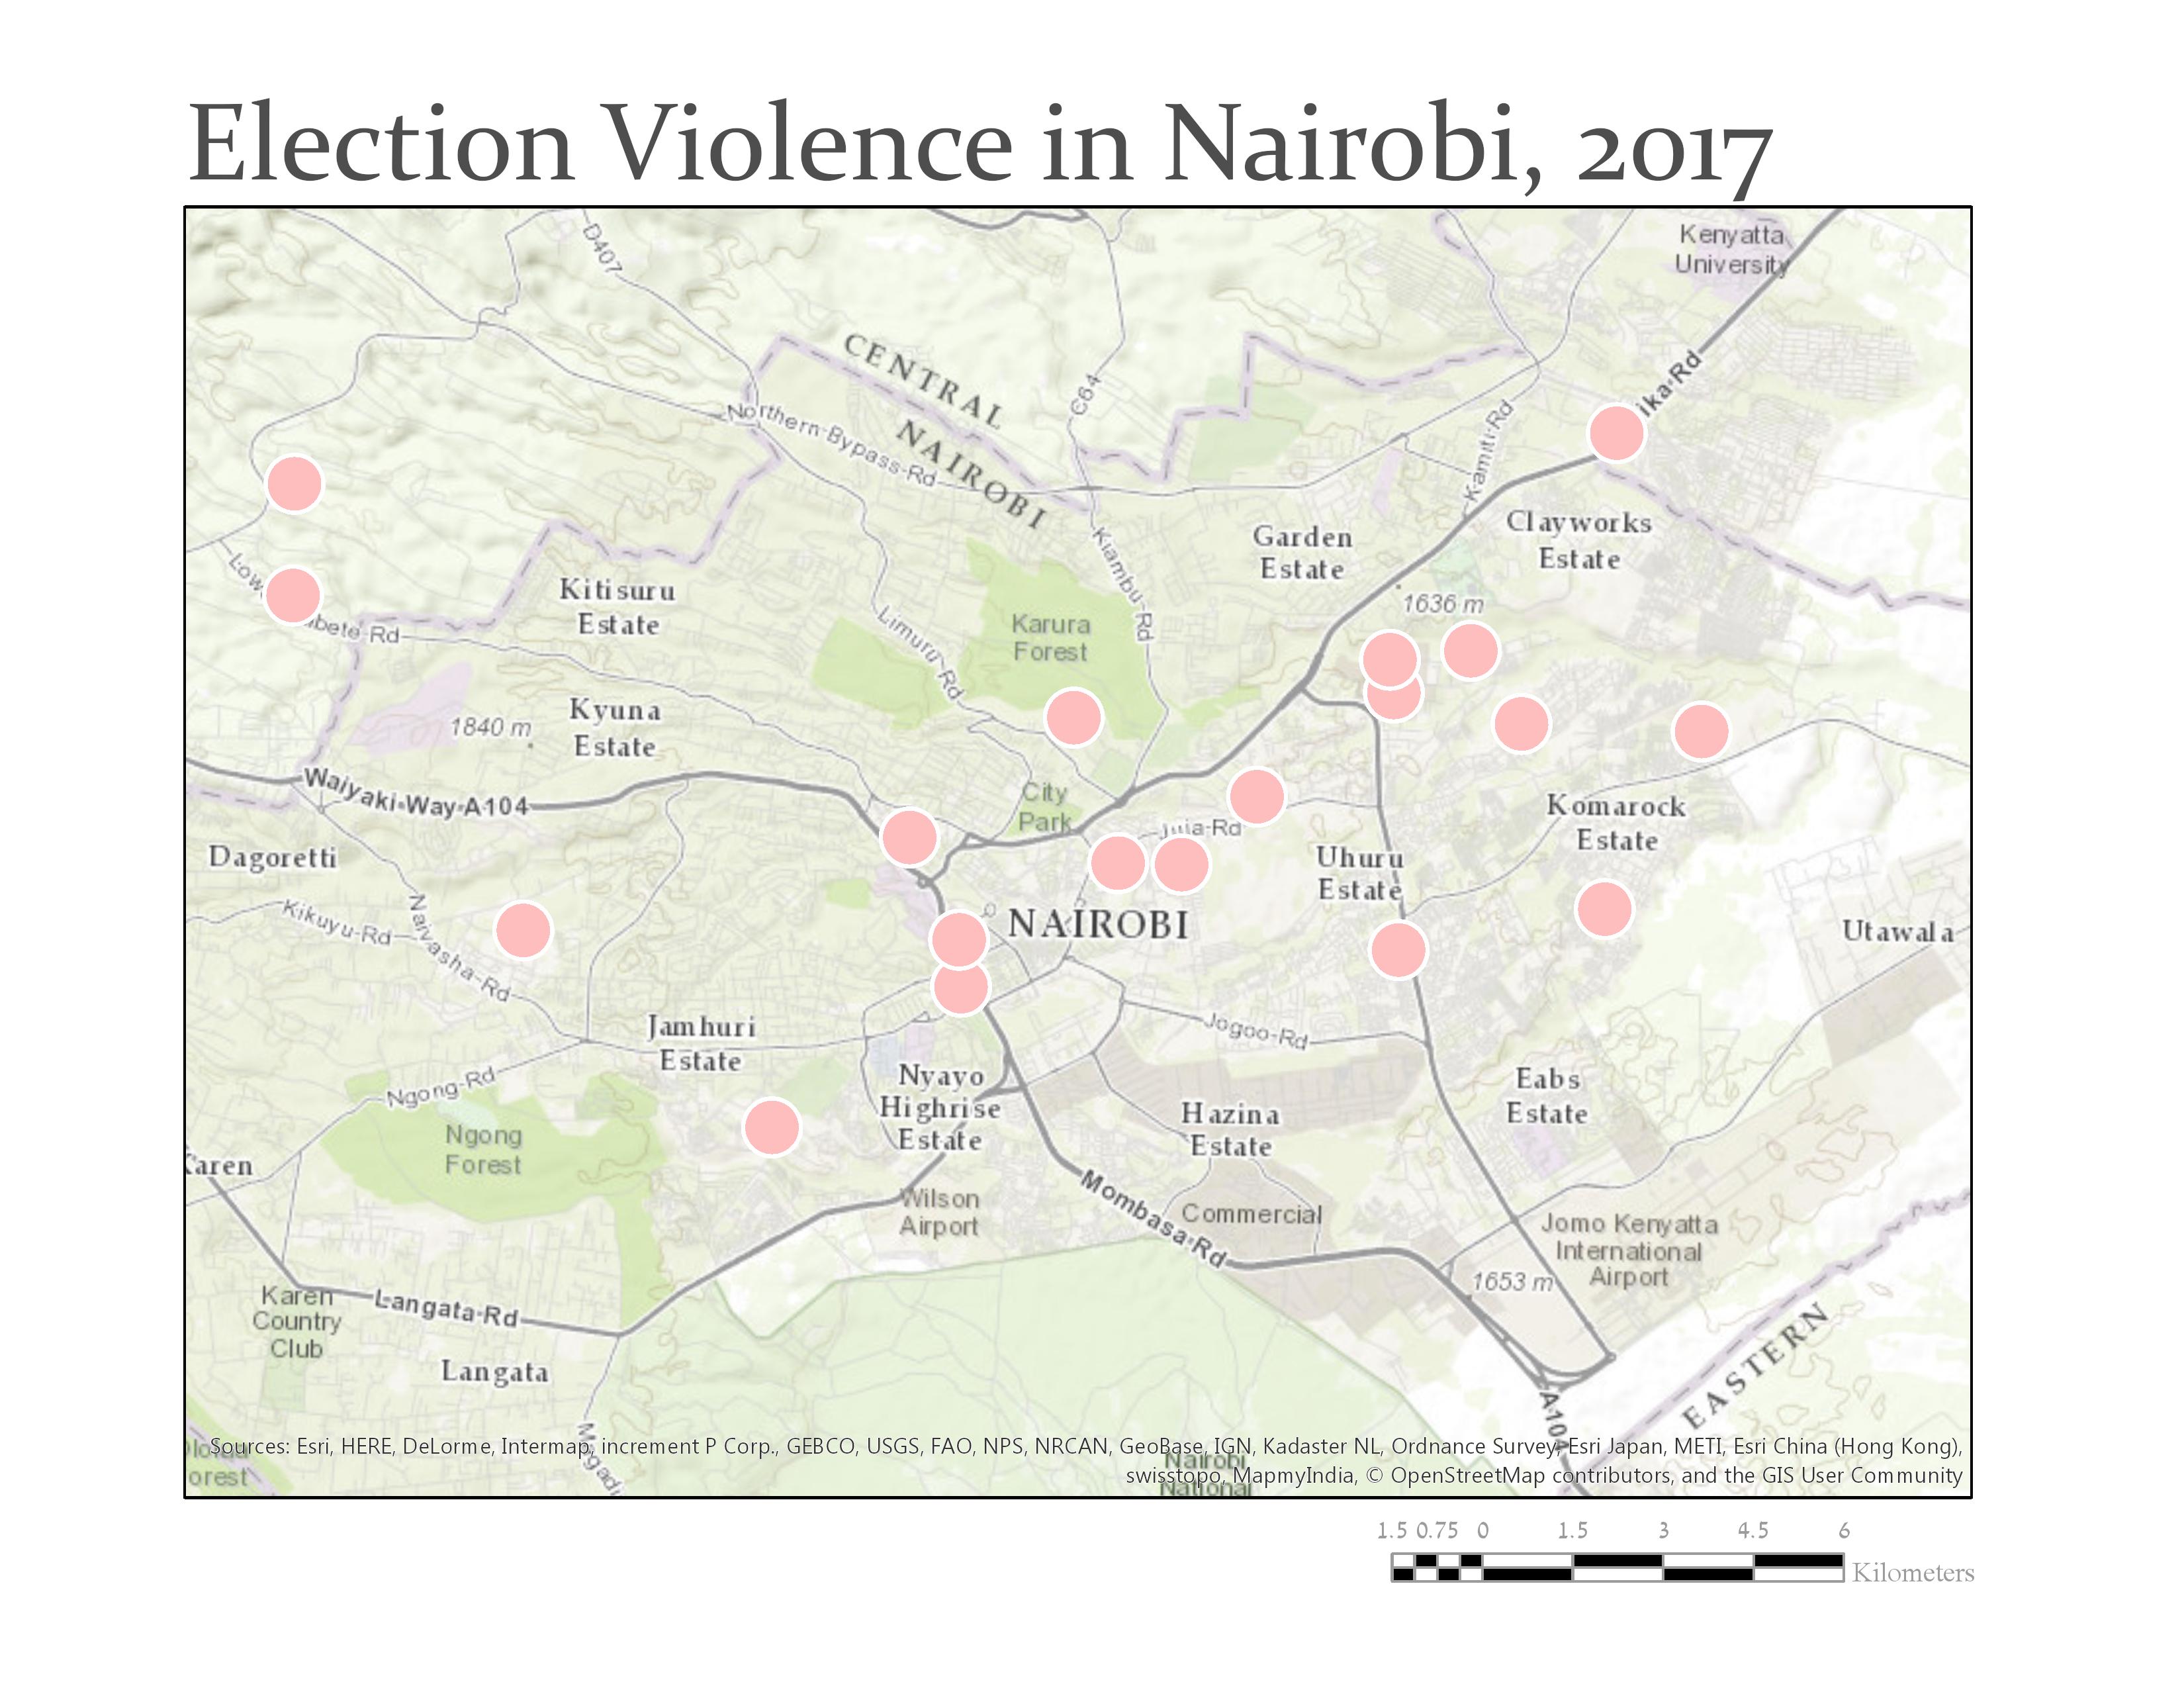 NairobiViolence